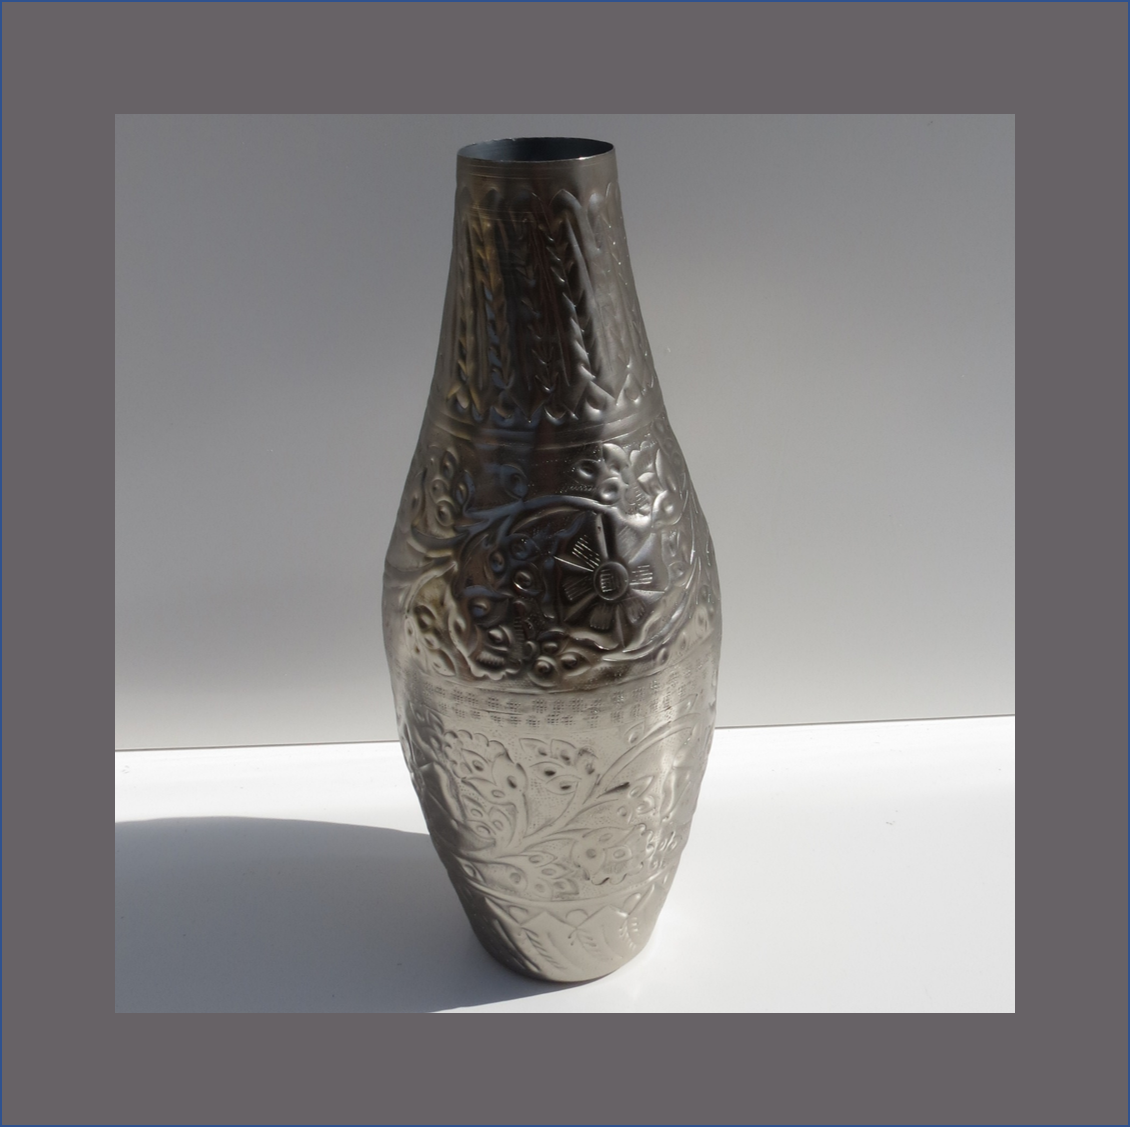 pewter-vase